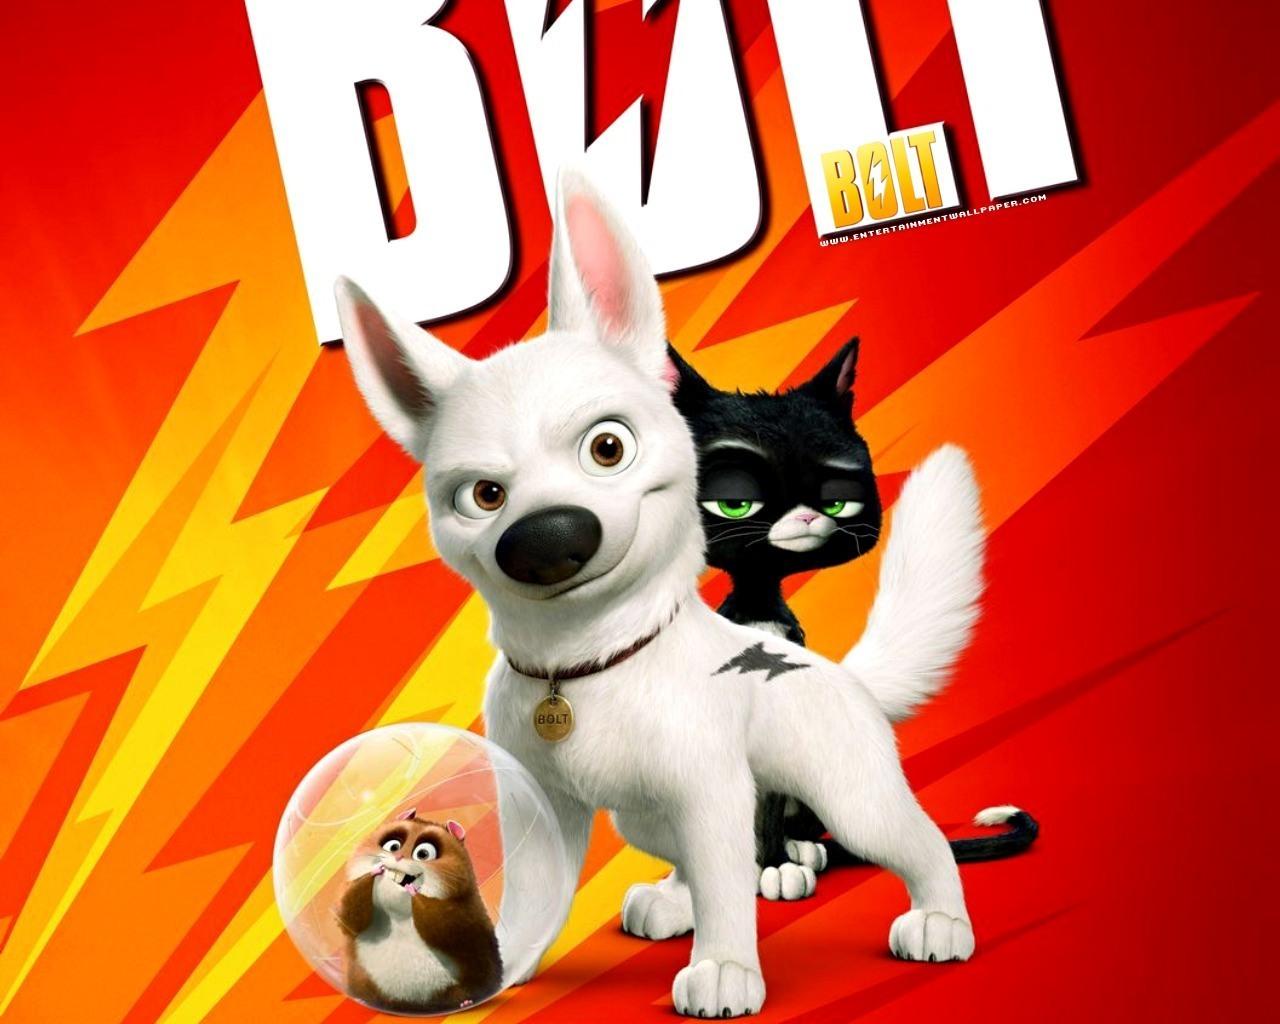 Bolt Wallpapers   Disneys Bolt Wallpaper 6251554 1280x1024